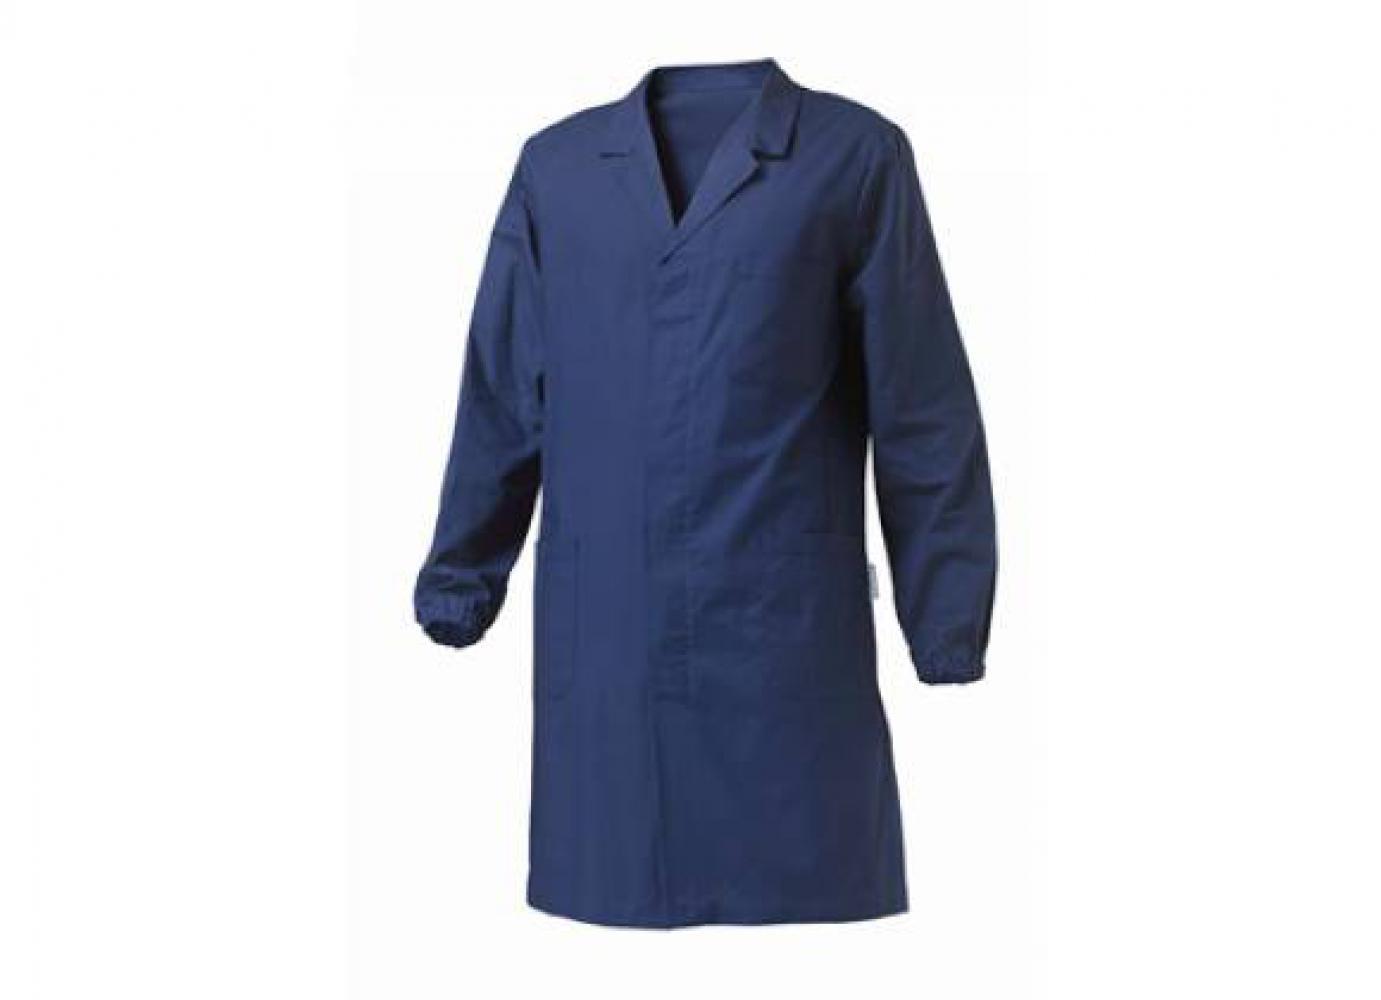 Acquista Camice Capri Blu Cotonegr 160 17545818 | Glooke.com